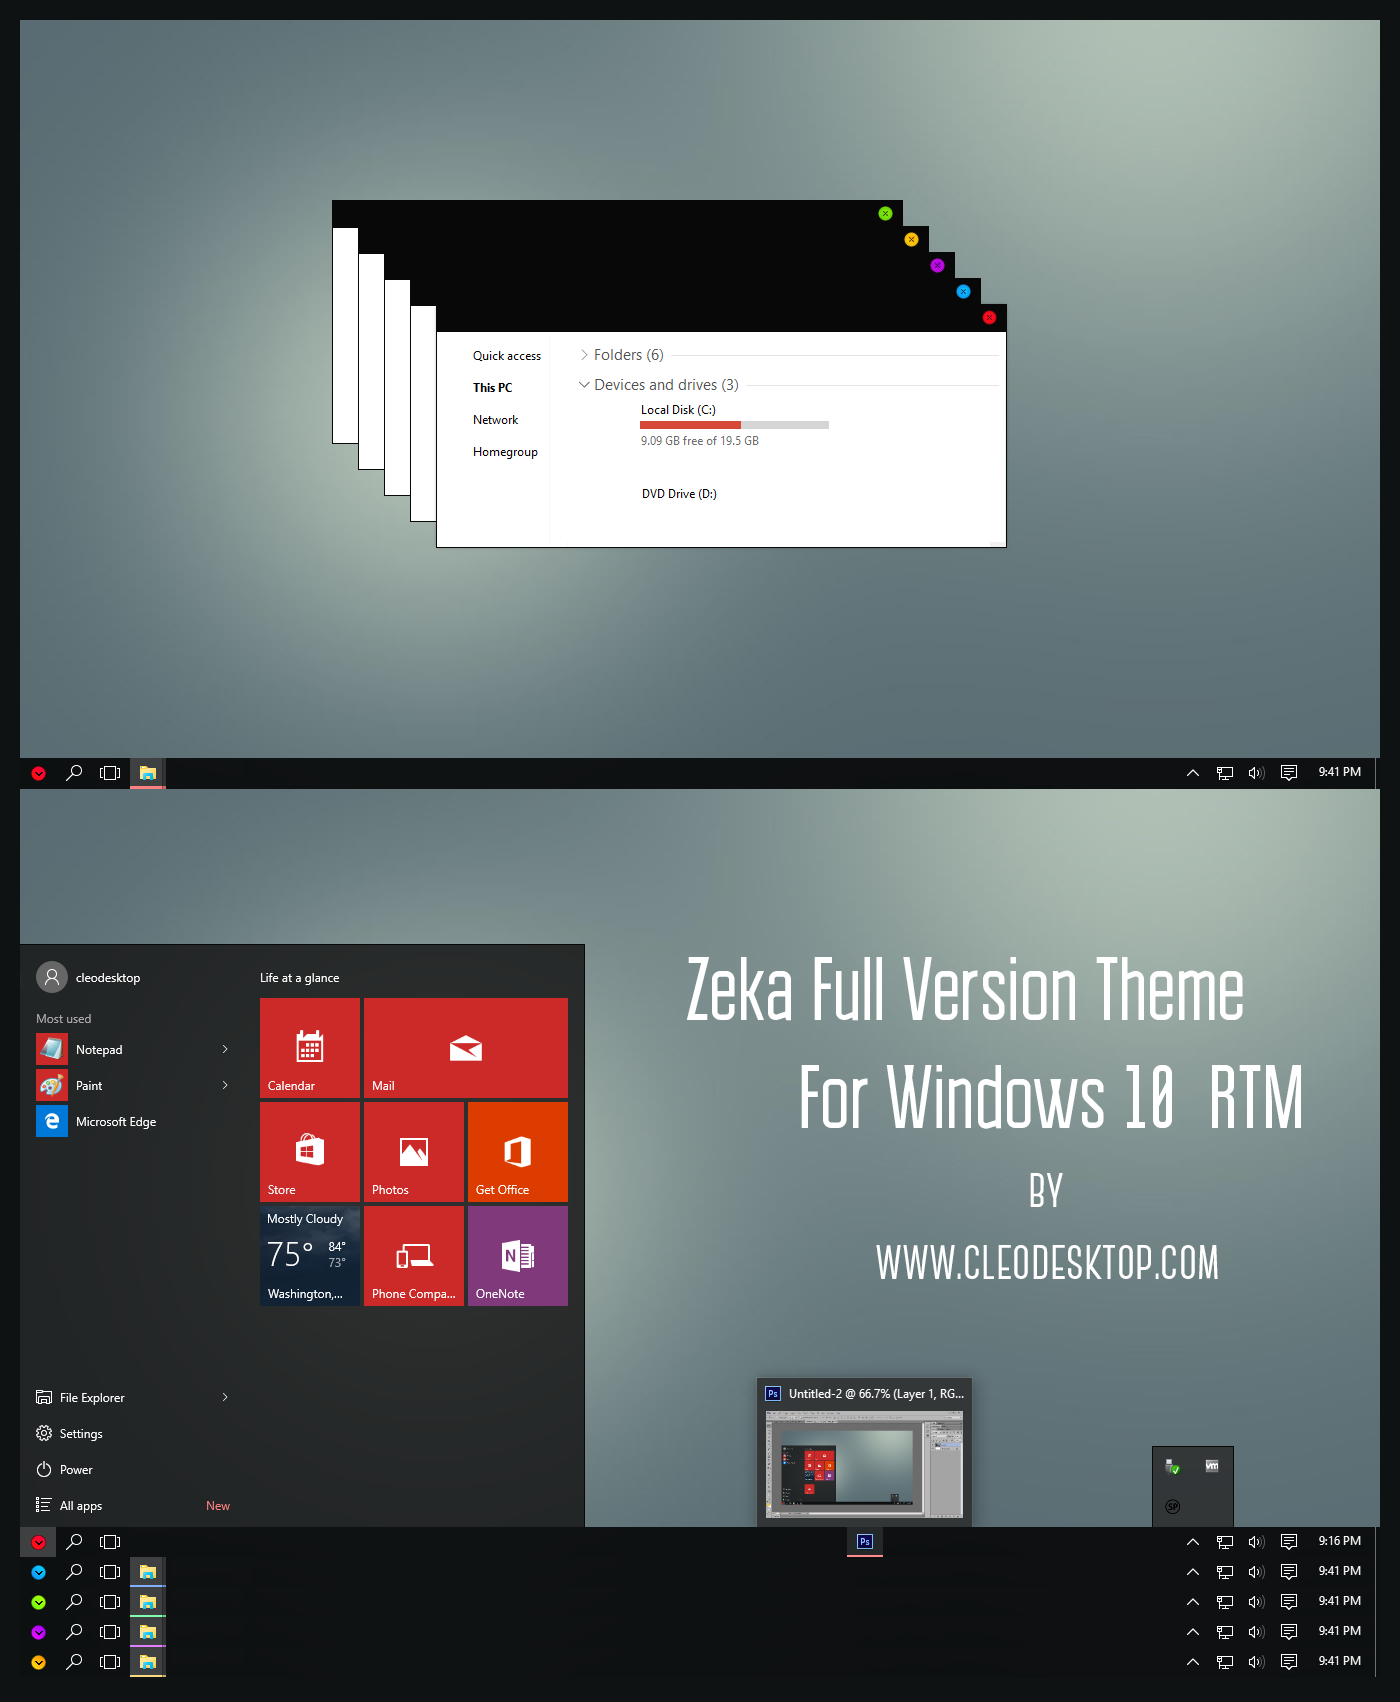 Zeka Full Vesion Theme Windows 10 RTM